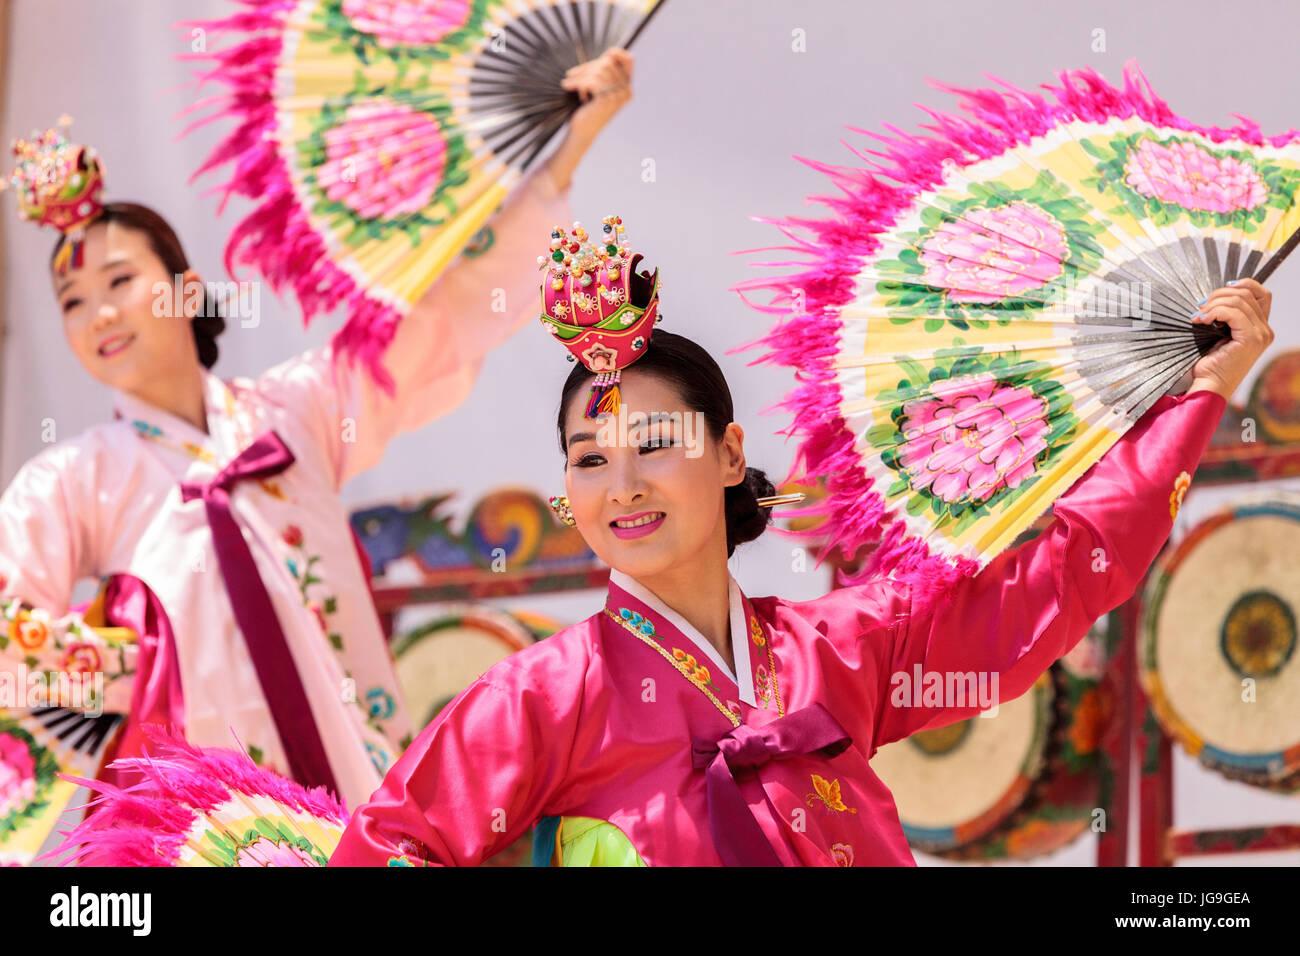 71e4cbdc1e0ba San Diego, CA, USA – July 1, 2017: Korean fan dance performed at the San  Diego Zoo Safari park. Editorial only.